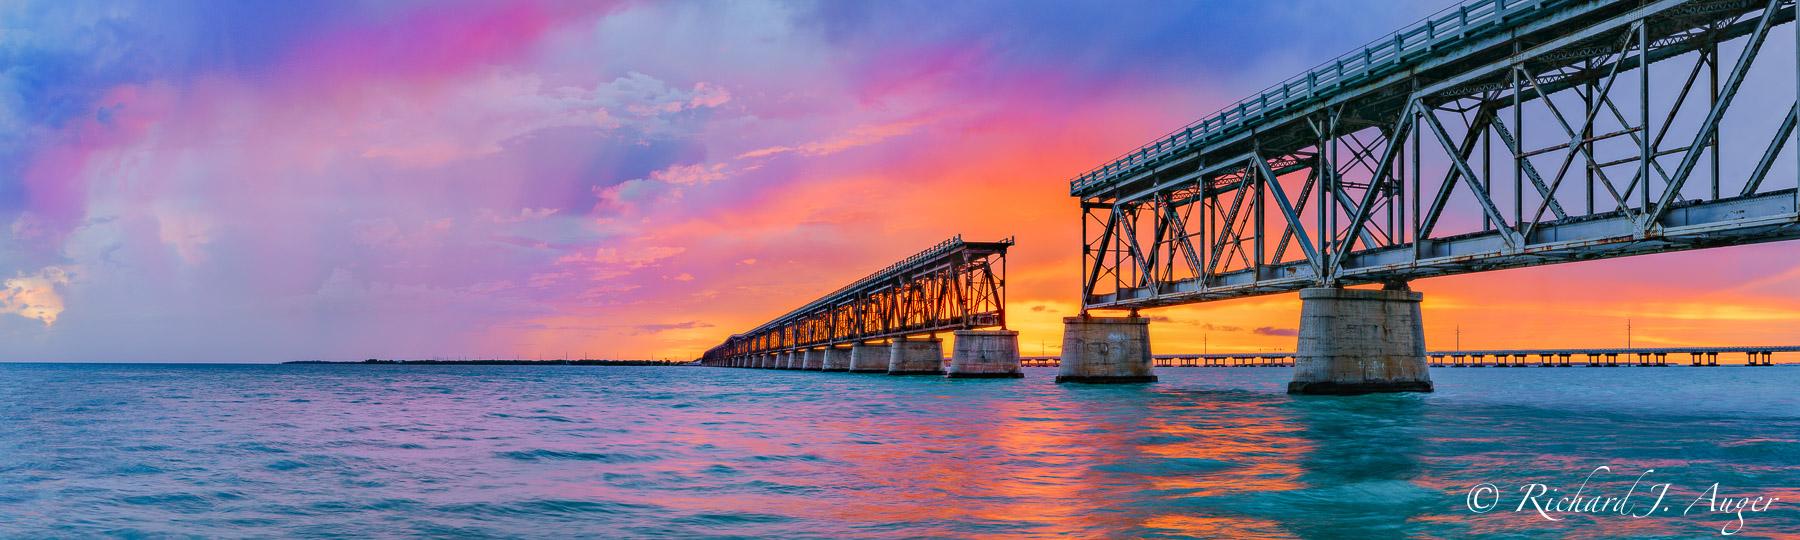 Bahia Honda Bridge, Florida Keys, Photograph, Photographer, Photo, Landscape, Sunset, Ocean, Brilliant